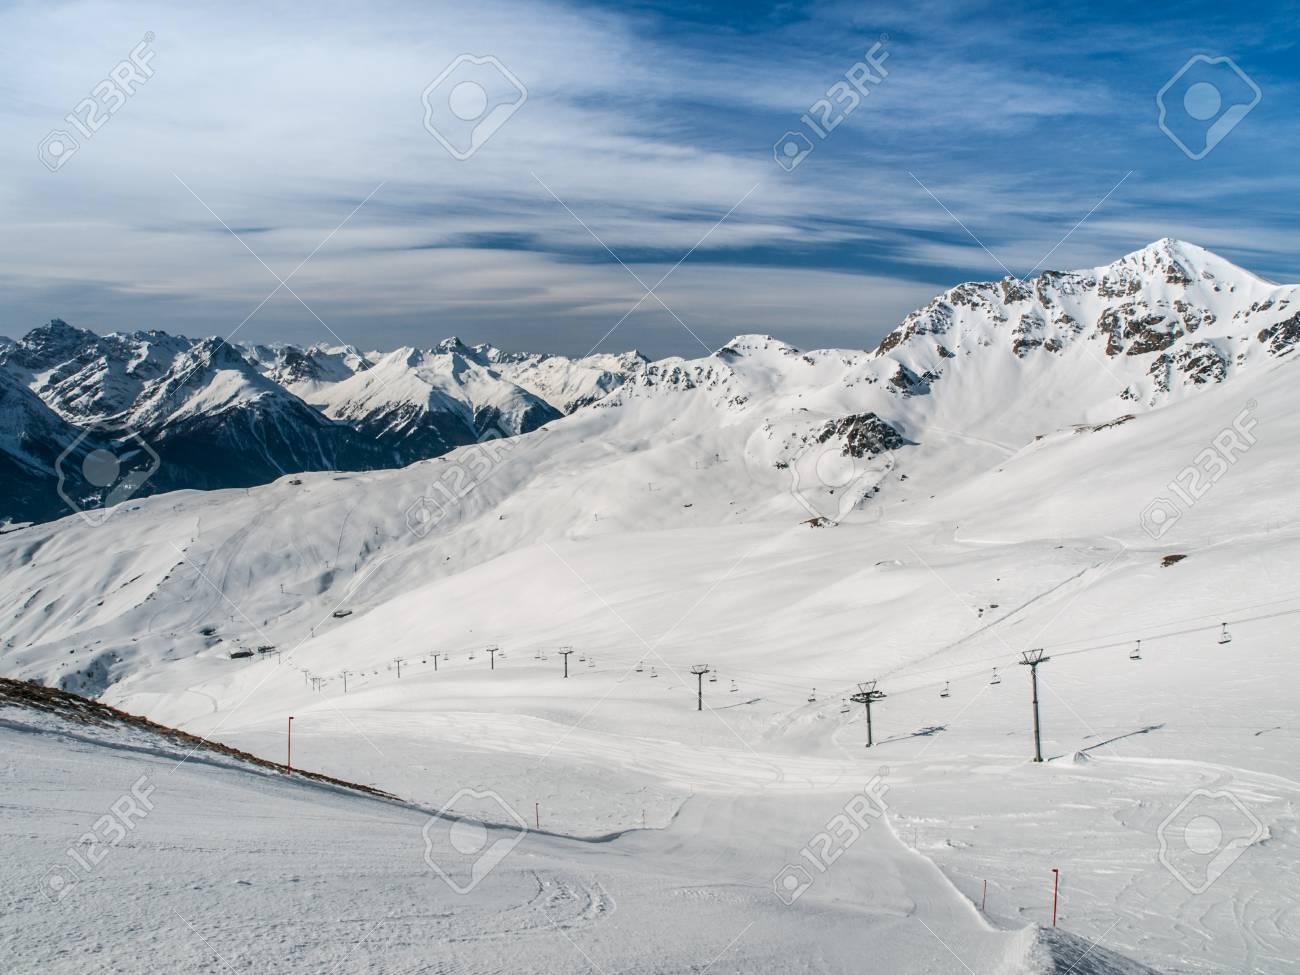 alpine ski resort scuol in swiss alps, graubunden, switzerland stock